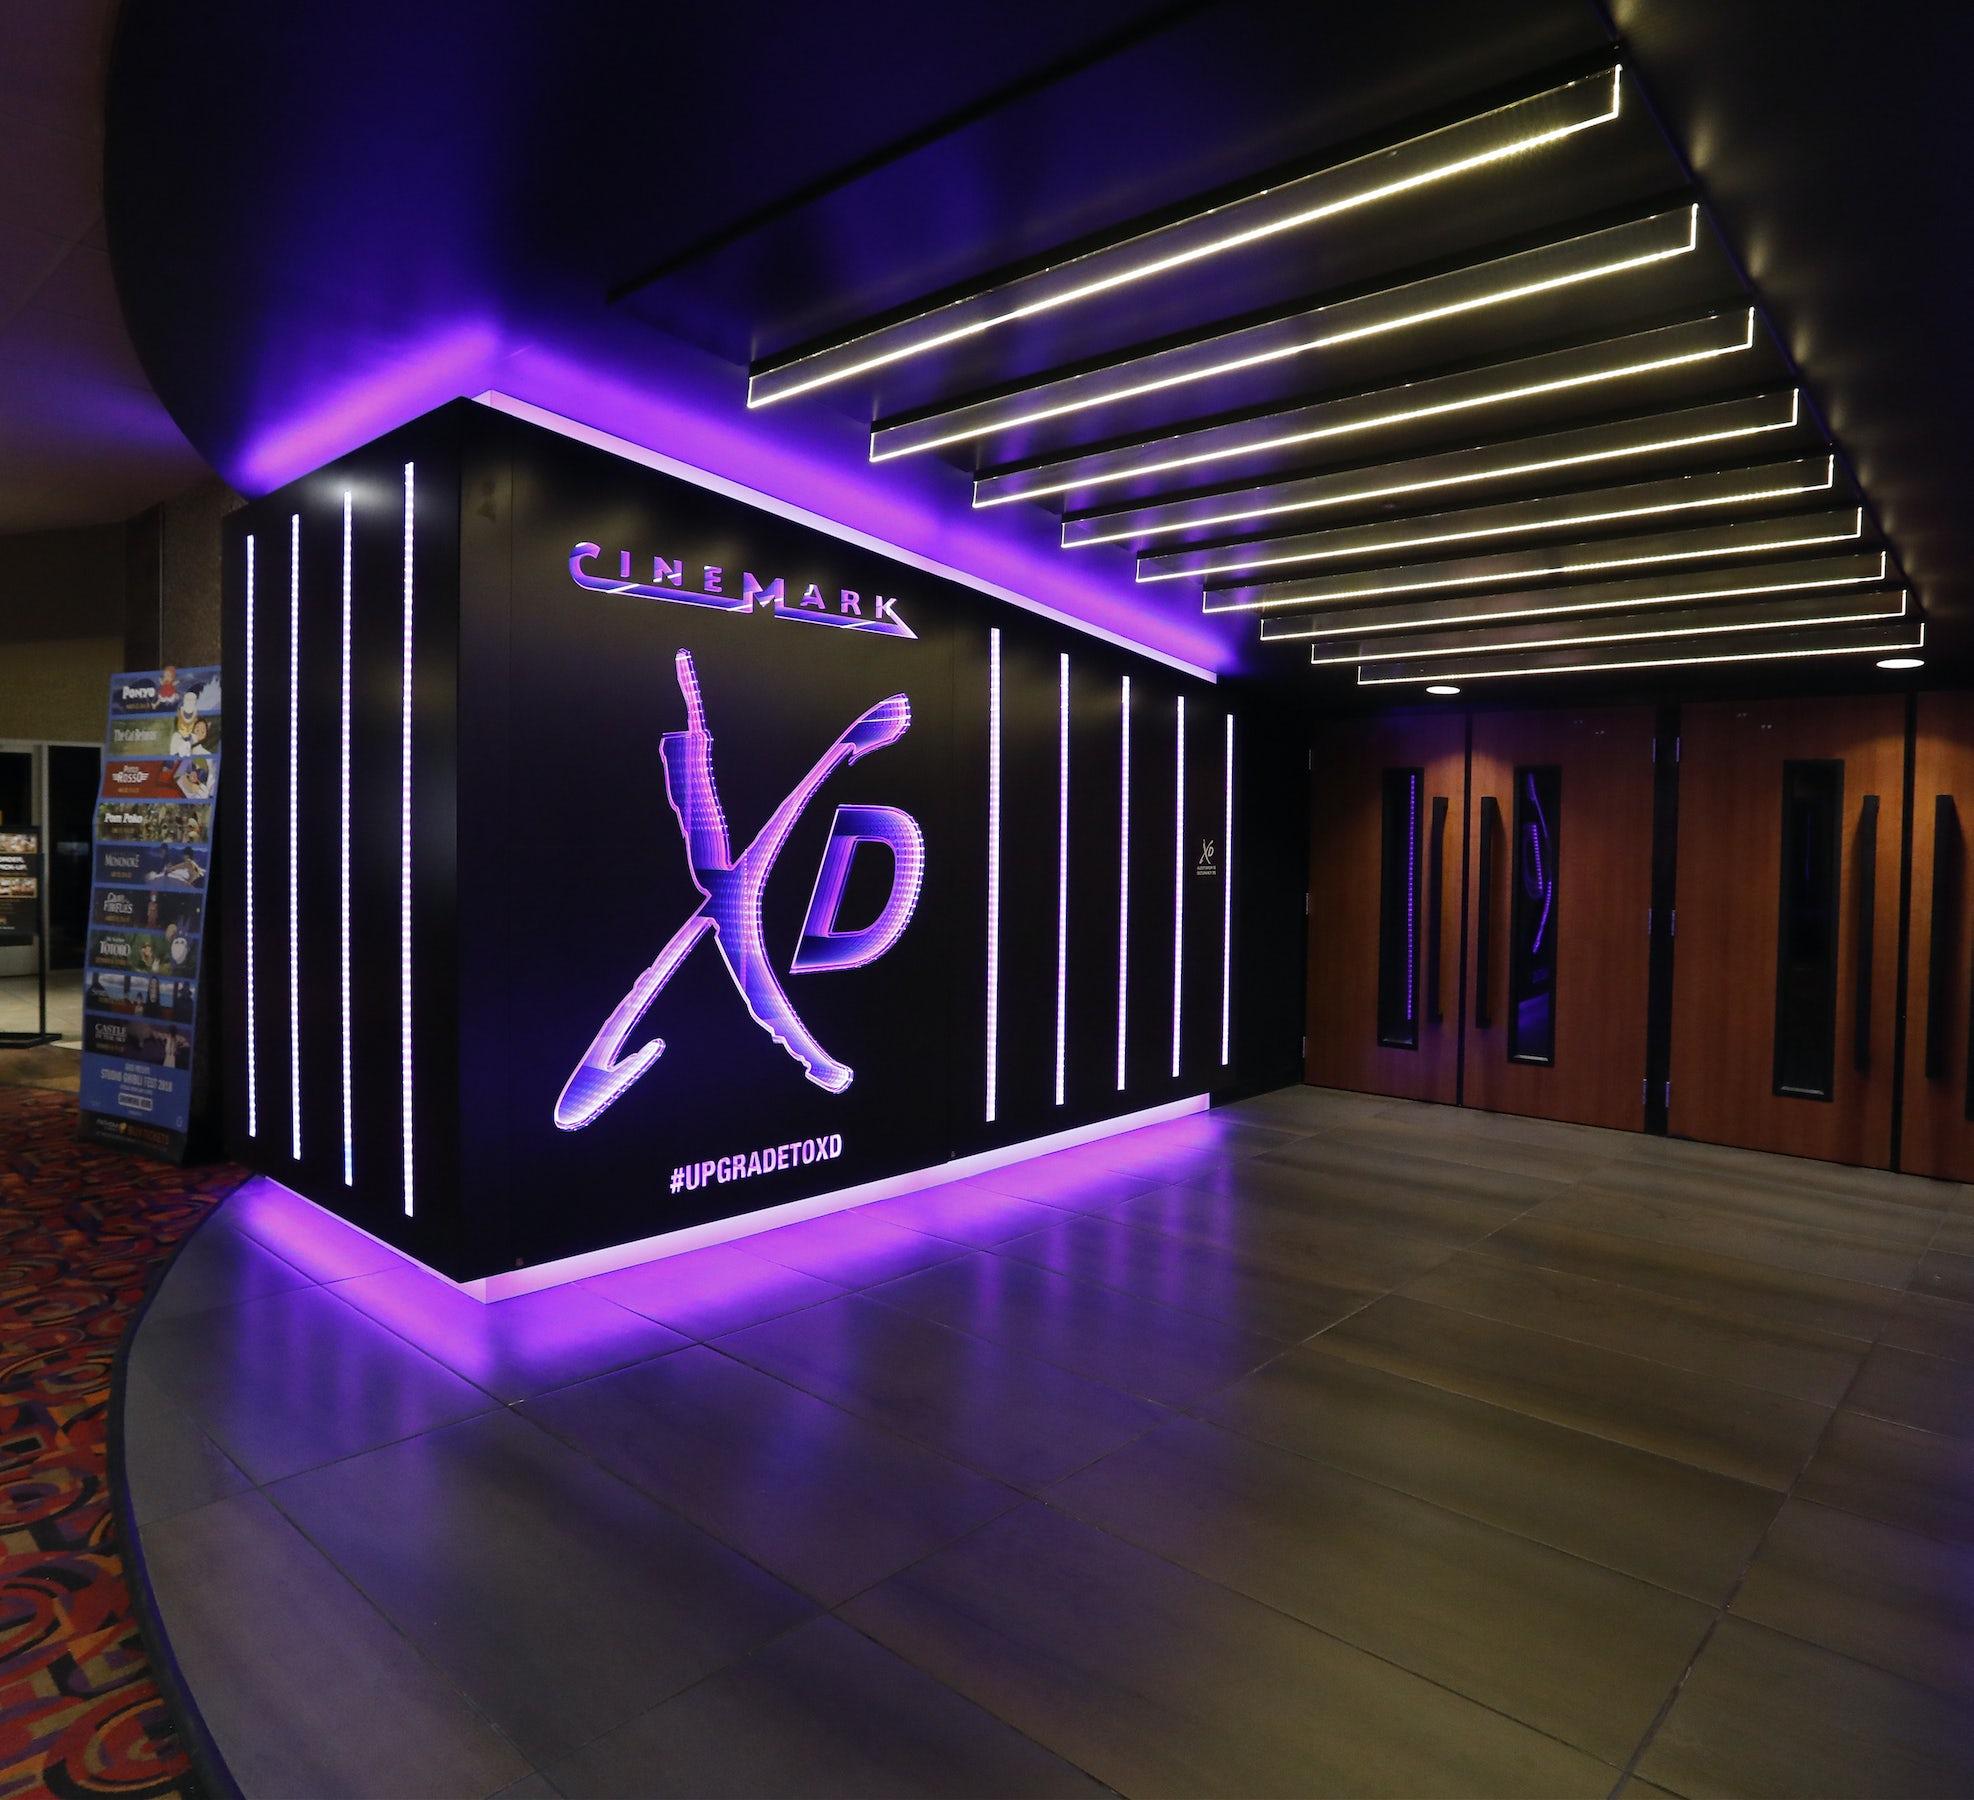 Cinemark - XD West Plano in Beyond Dallas